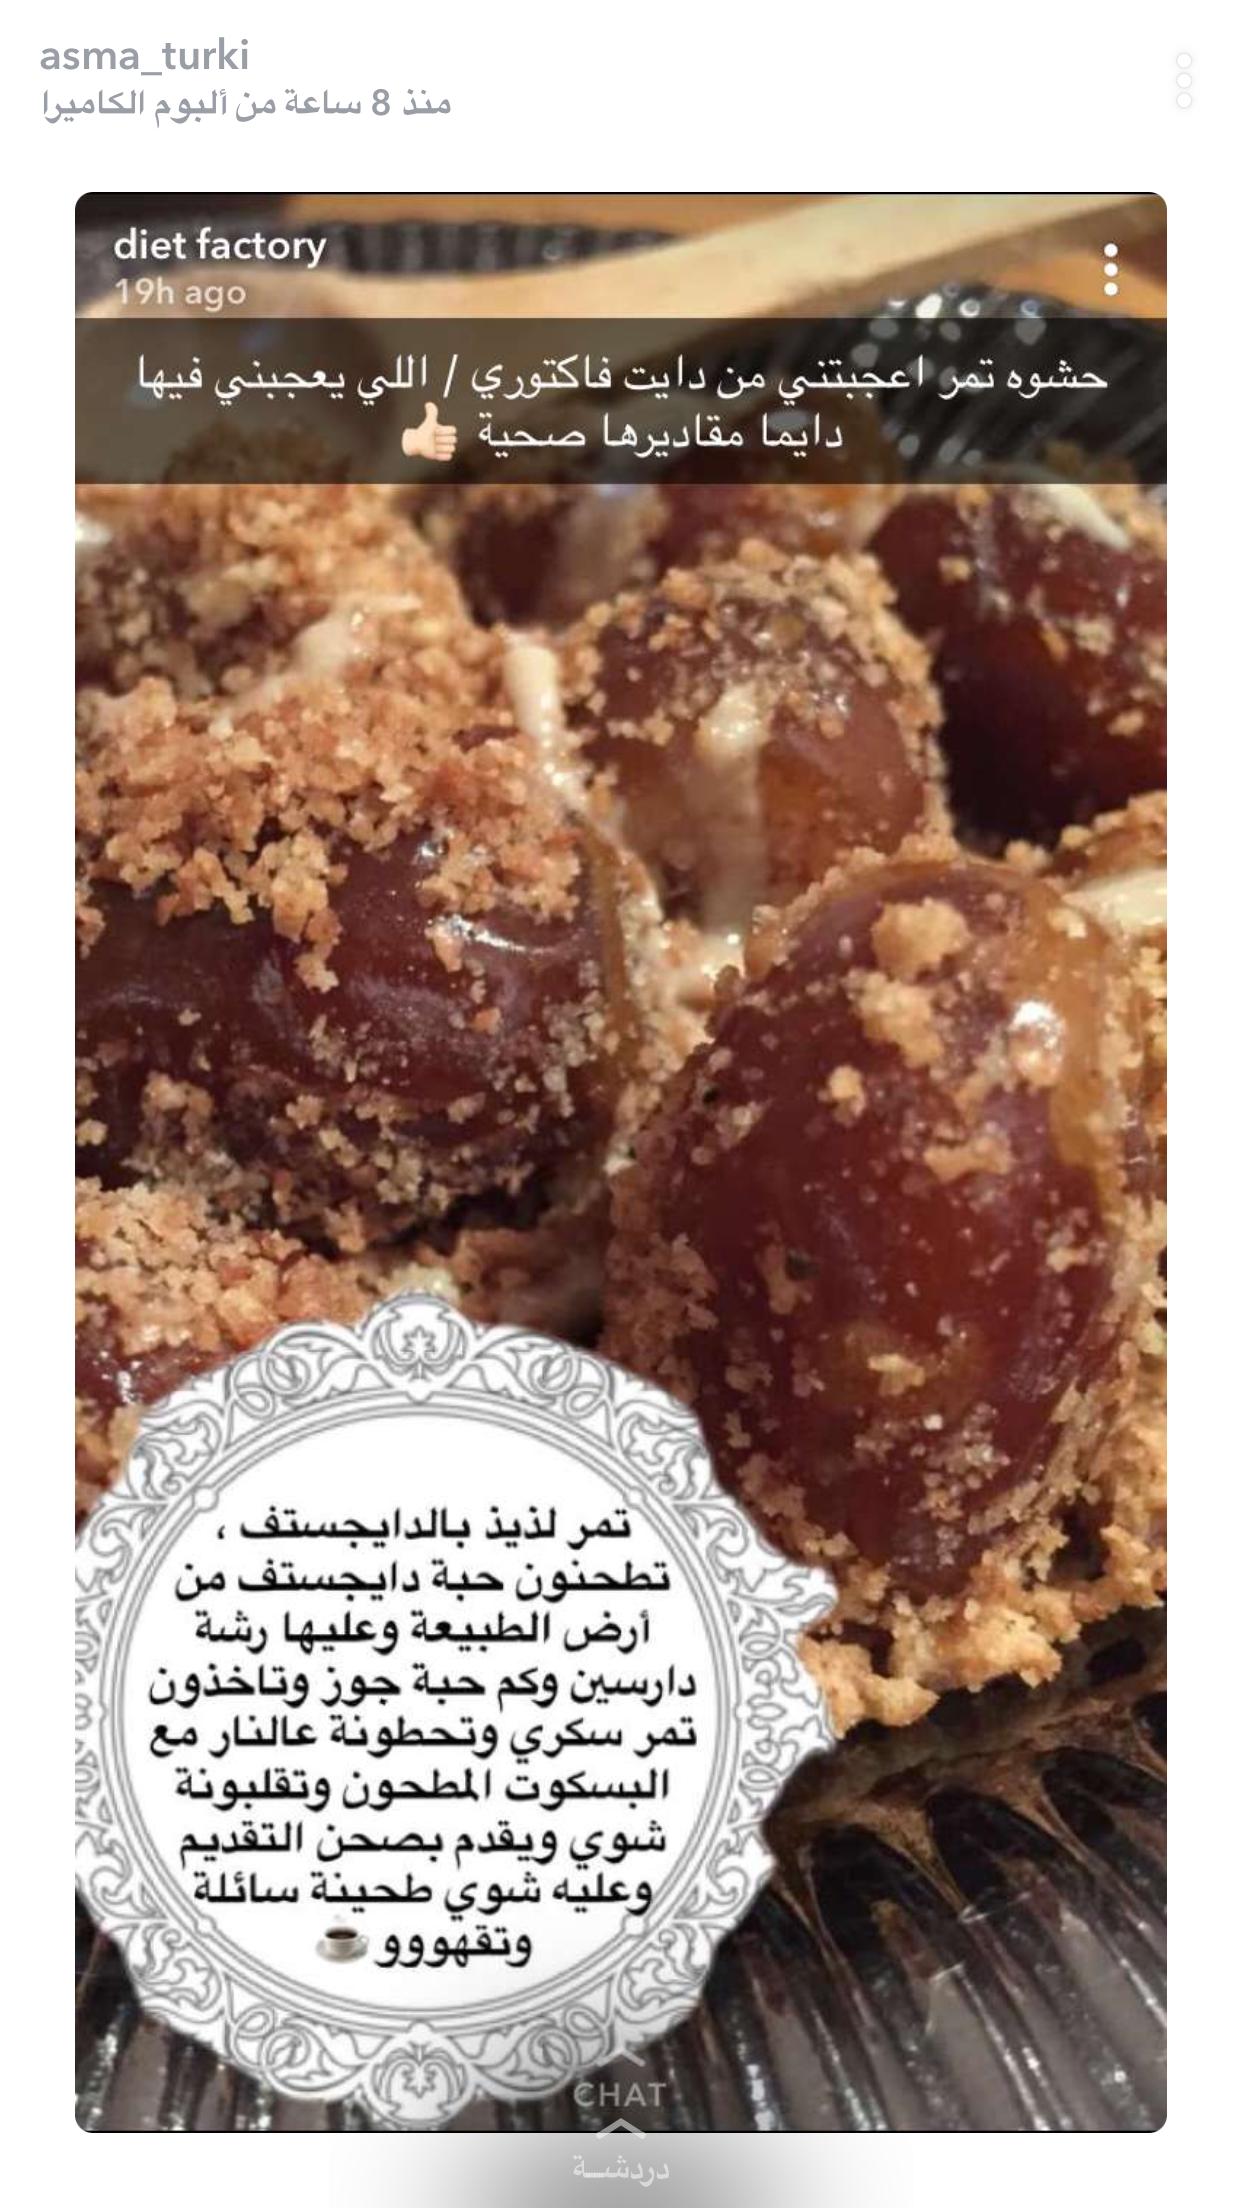 Pin By Eman Al Hajri On سويت Yummy Food Dessert Food Recipies Coffee Drink Recipes